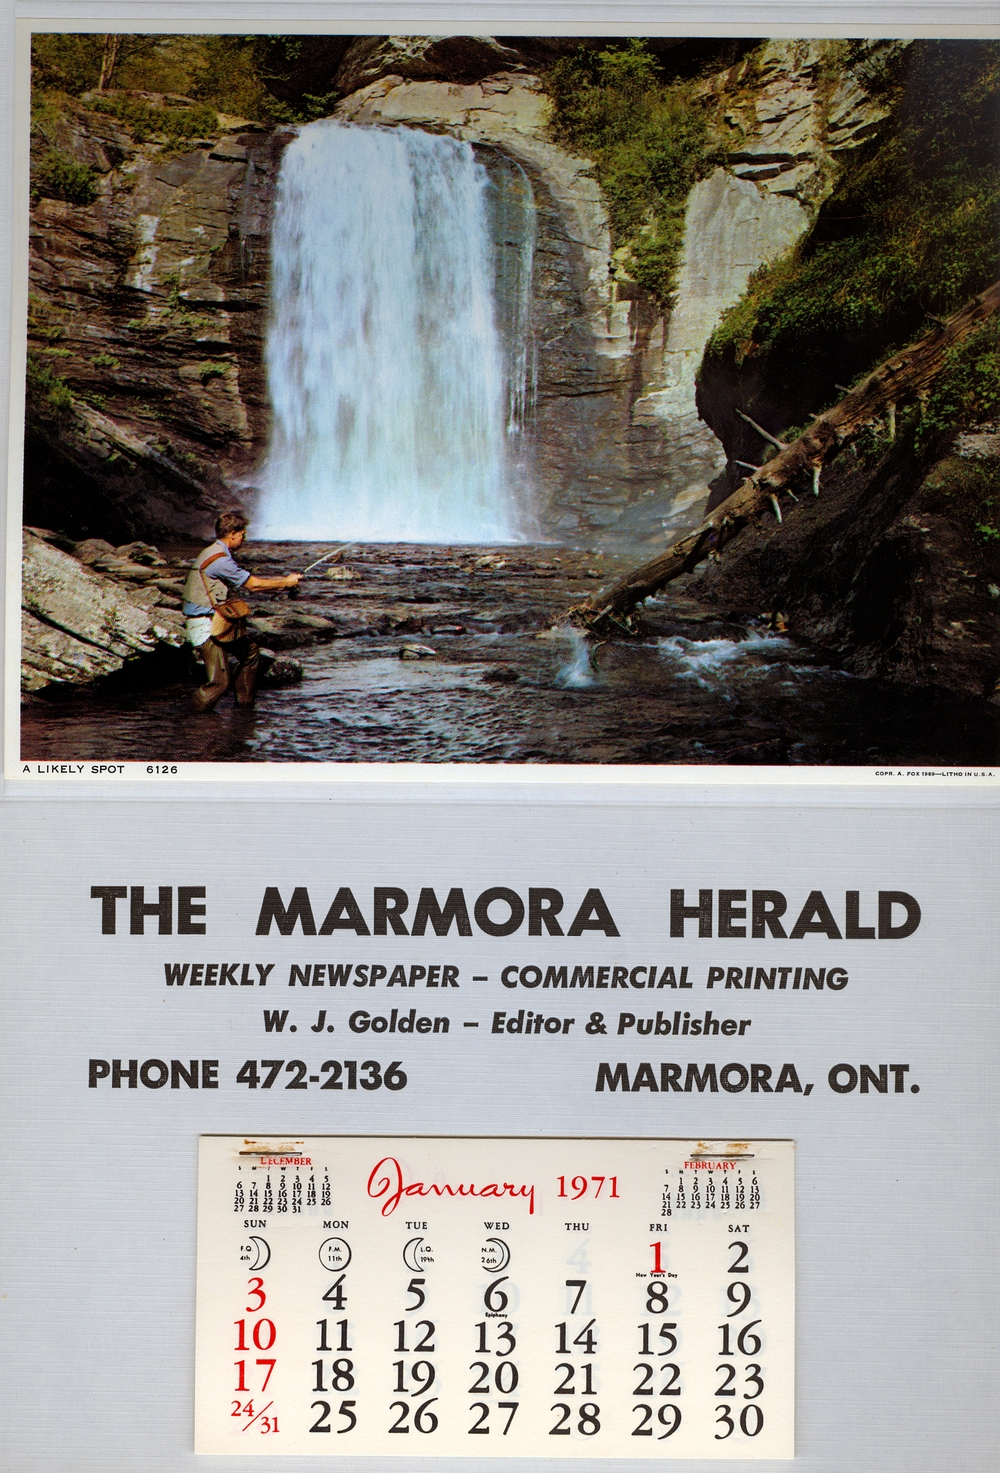 1971,  Marmora Business,  Marmora Herald.jpg